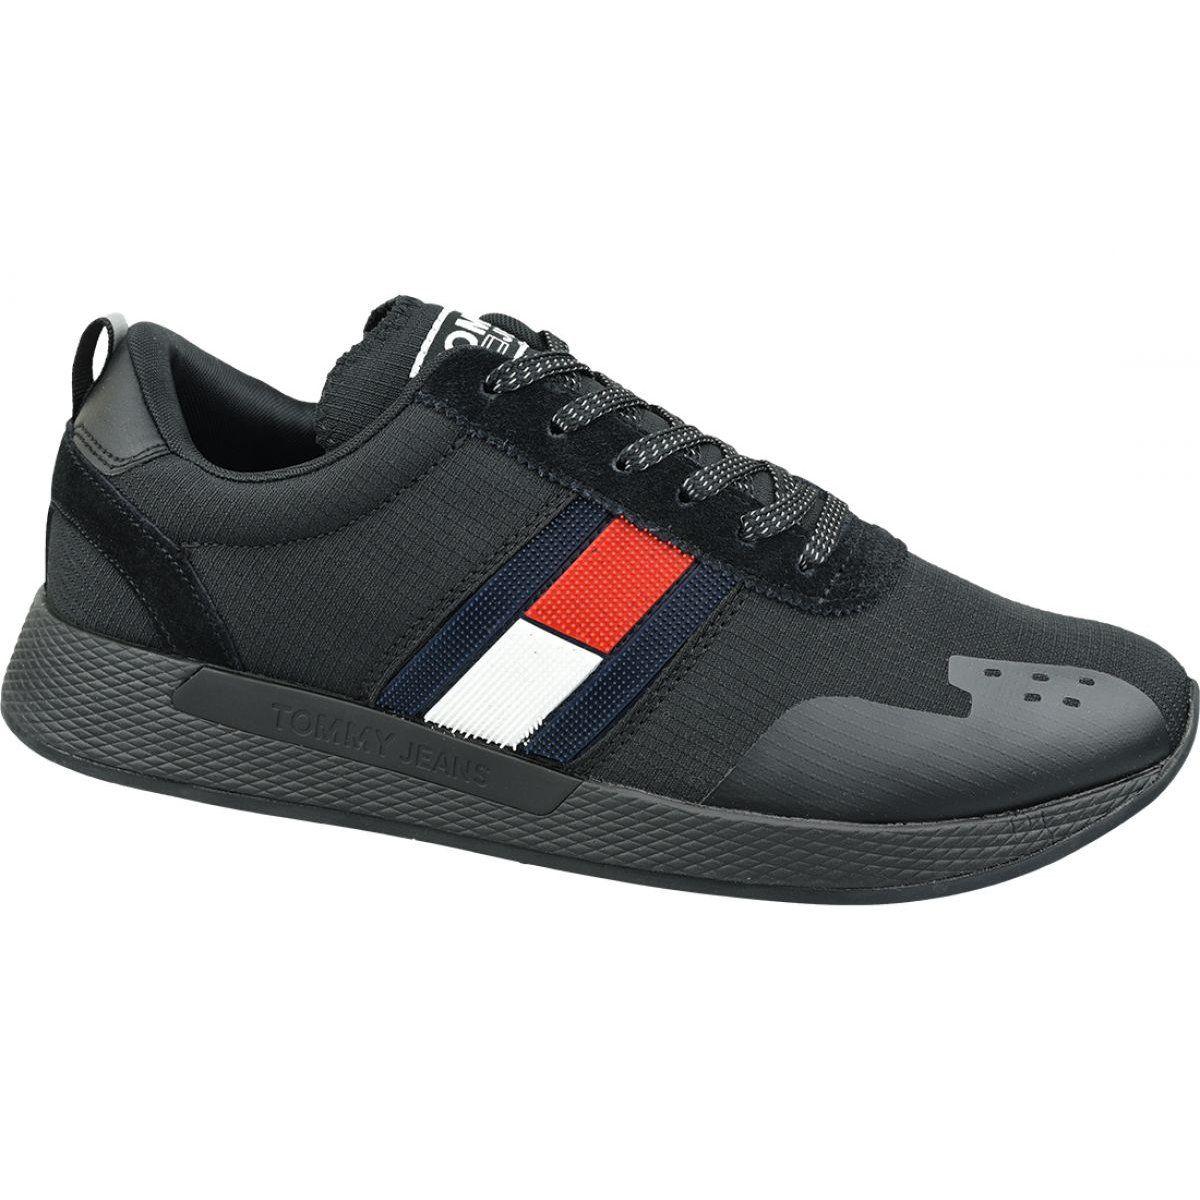 Buty Nike Md Runner 2 807316 403 R 36 40 New 2016 6326265778 Oficjalne Archiwum Allegro Nike Nike Free Shoes Nike Shoes